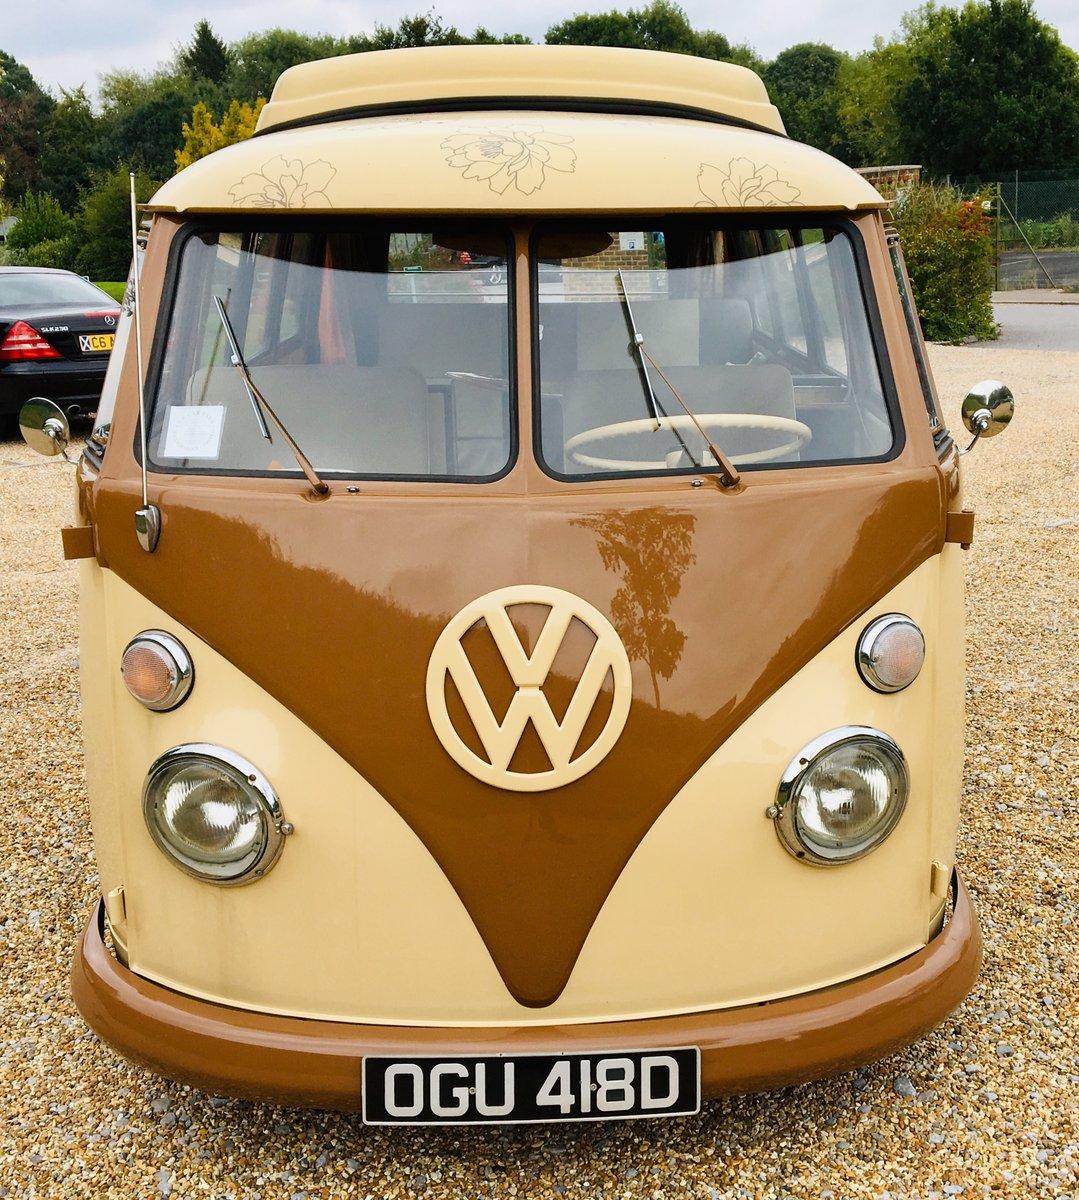 1966 VW Volkswagen Type 2 Split Screen Camper For Sale (picture 7 of 12)